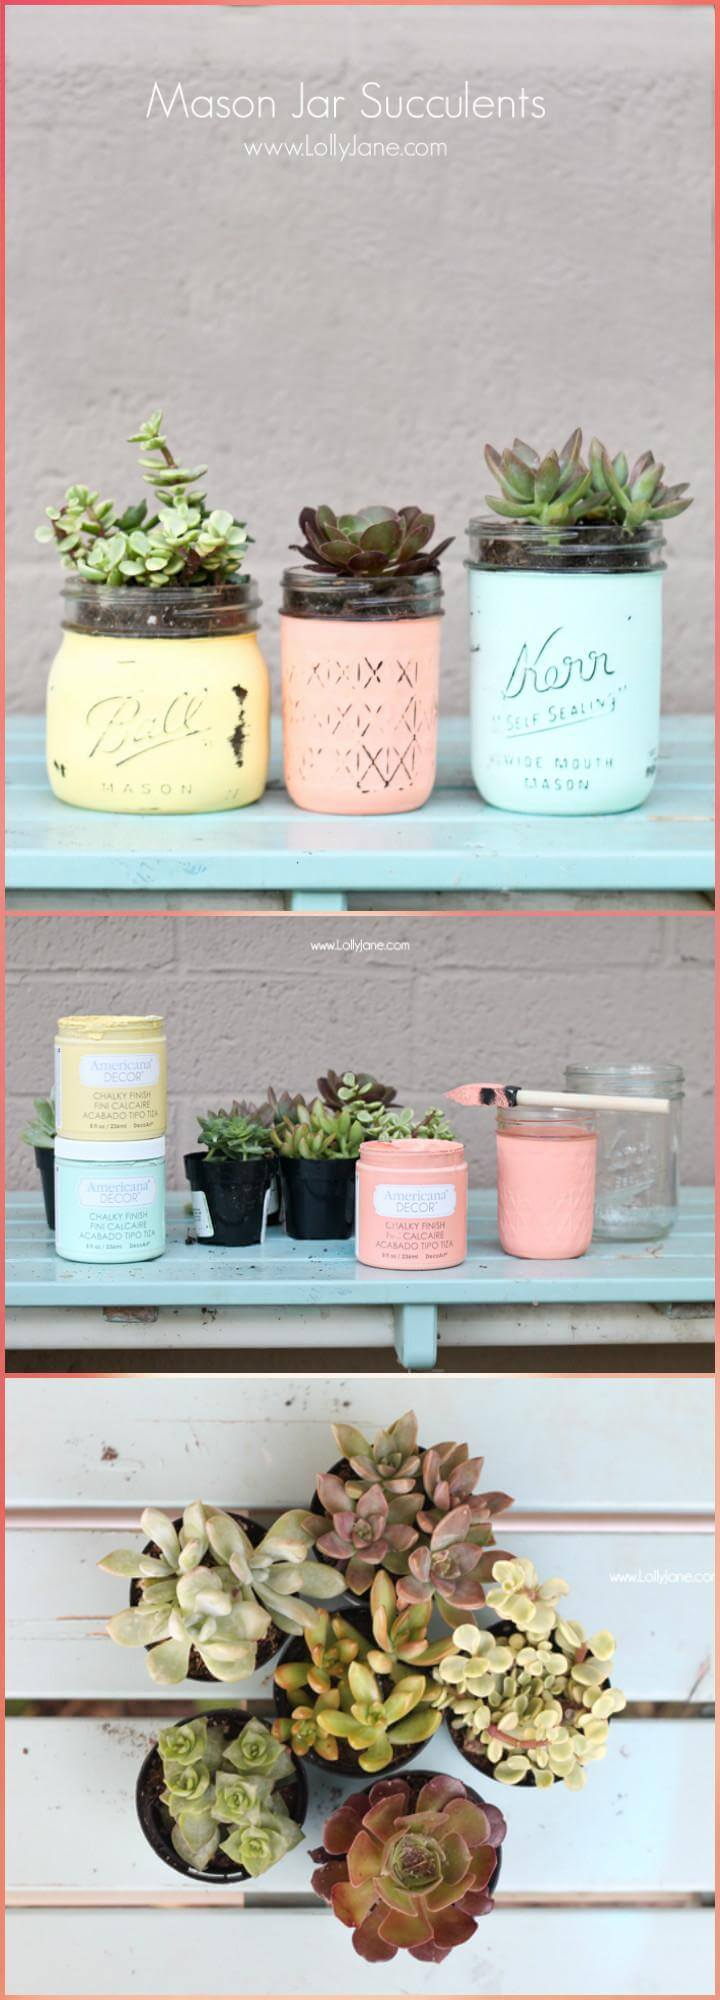 repurposed painted Mason jar succulents